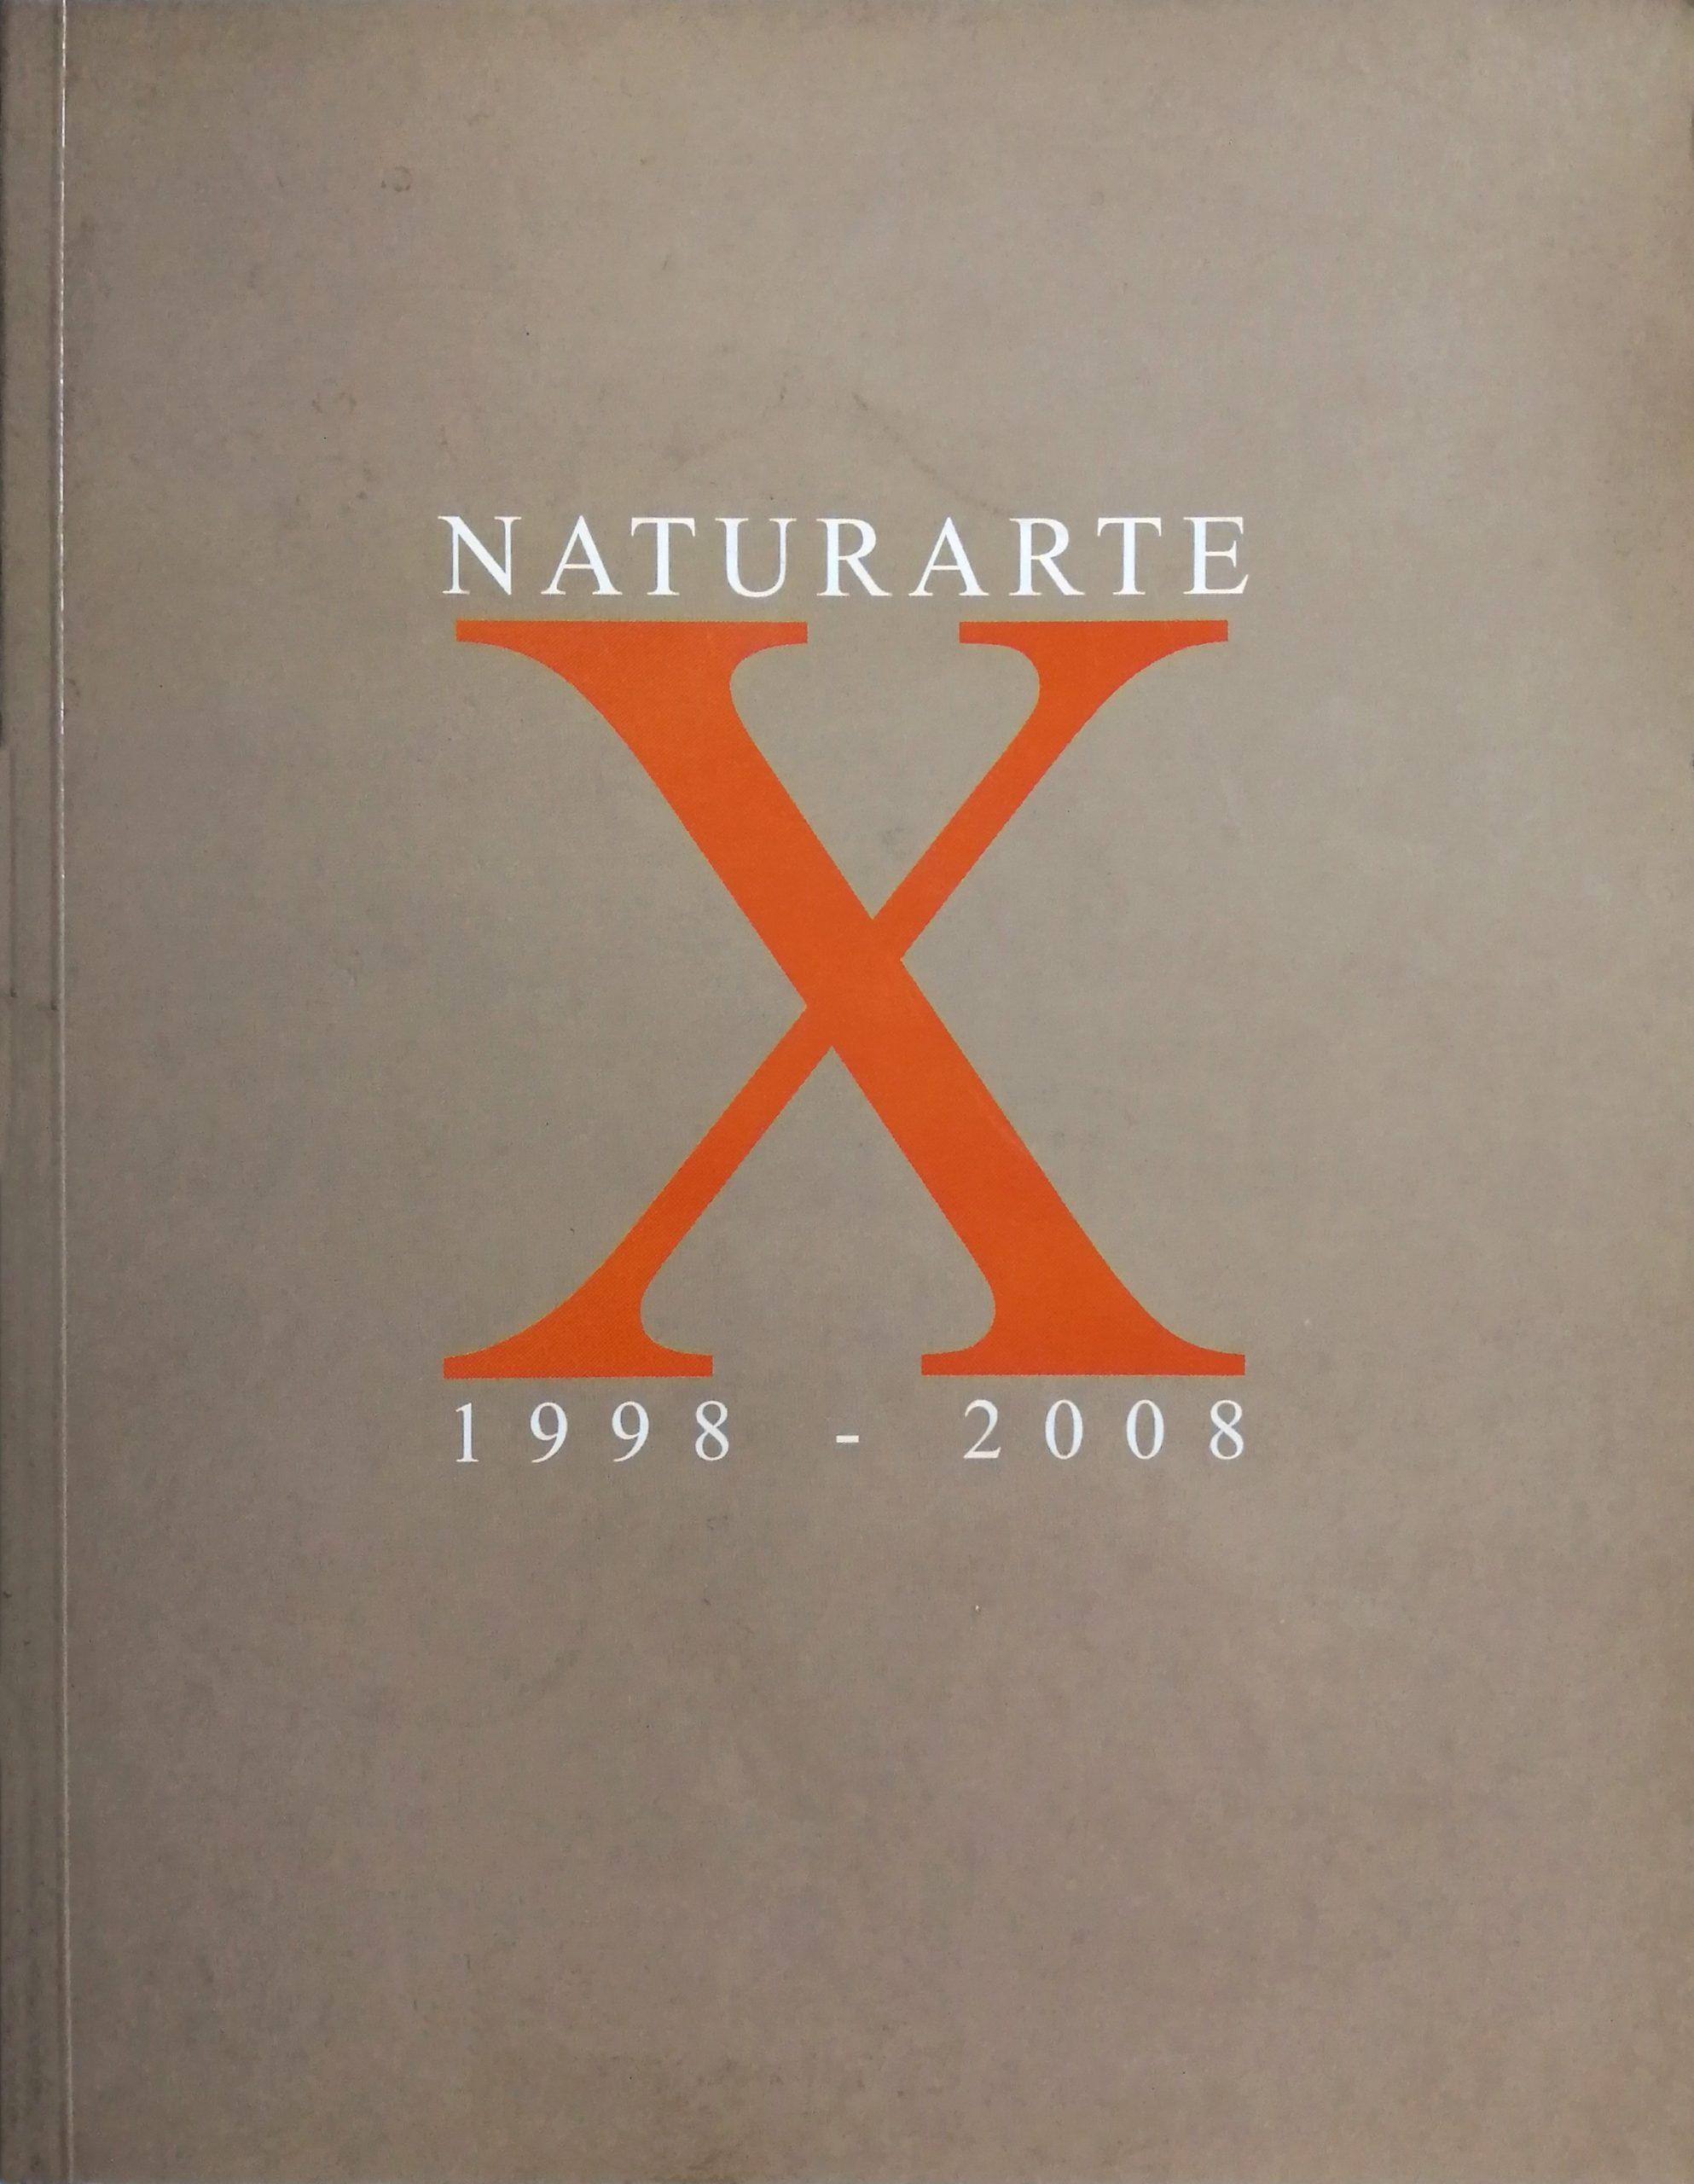 2007 Naturarte Arsenale di Bertonico scaled - Bibliography/ Catalogues